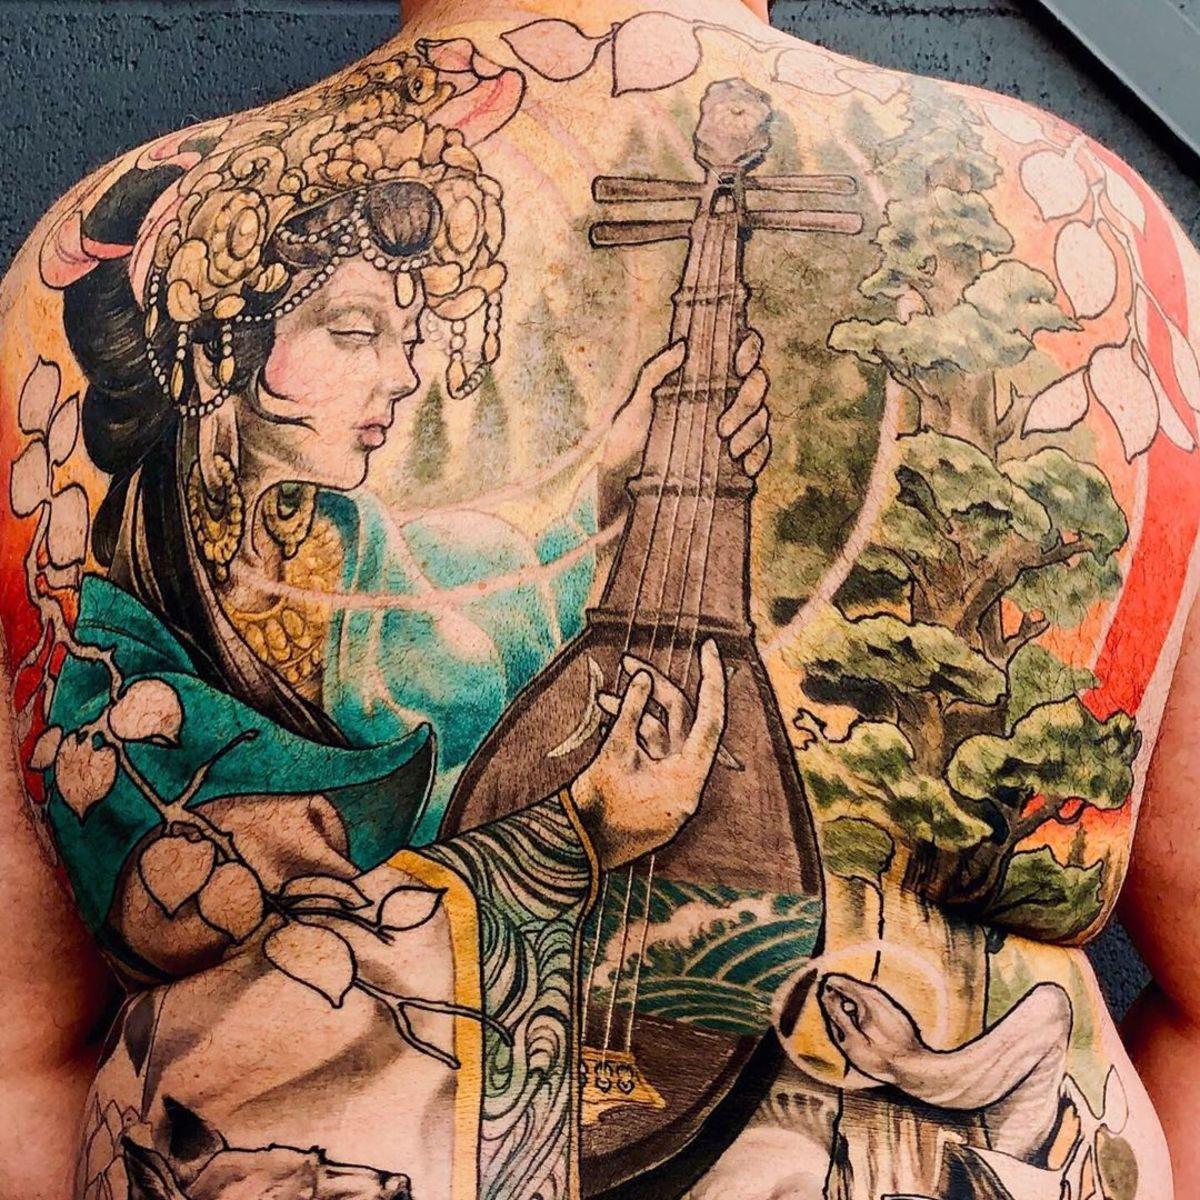 Benzaiten tattoo with white snake by Jonathan William Mattice.